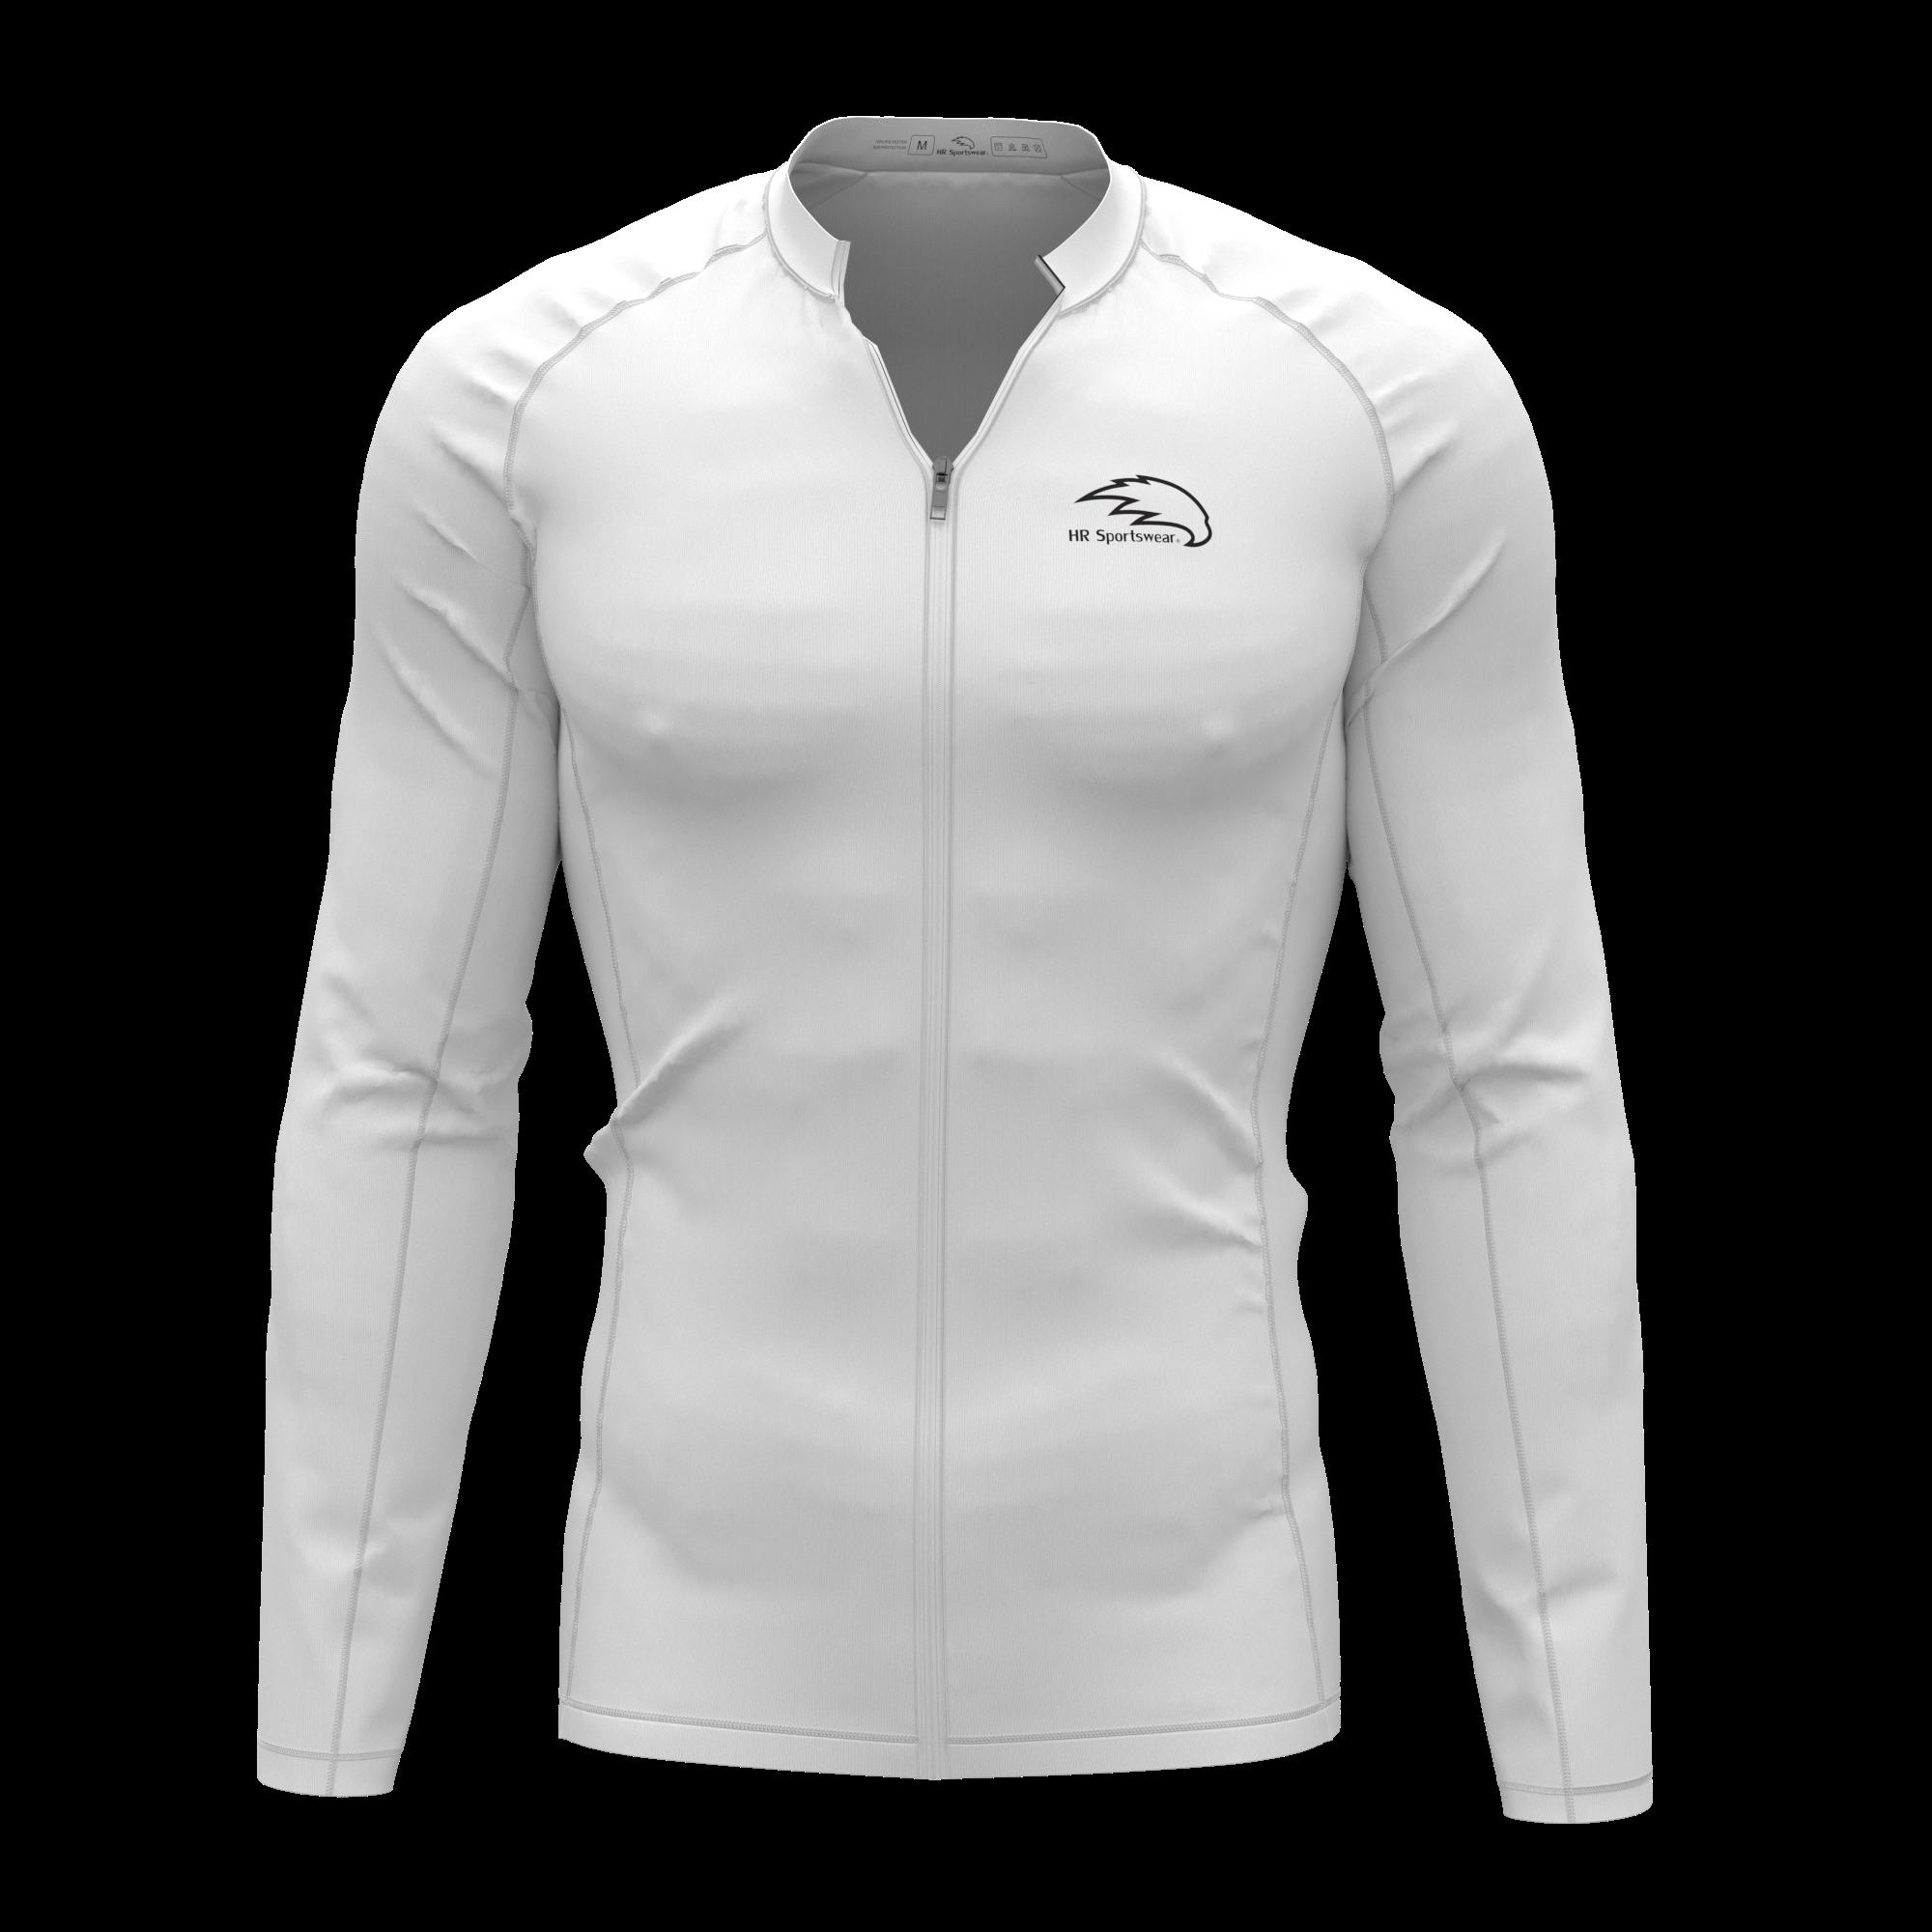 556486b9e Long Sleeve Thermal Elite – HR Sports Wear